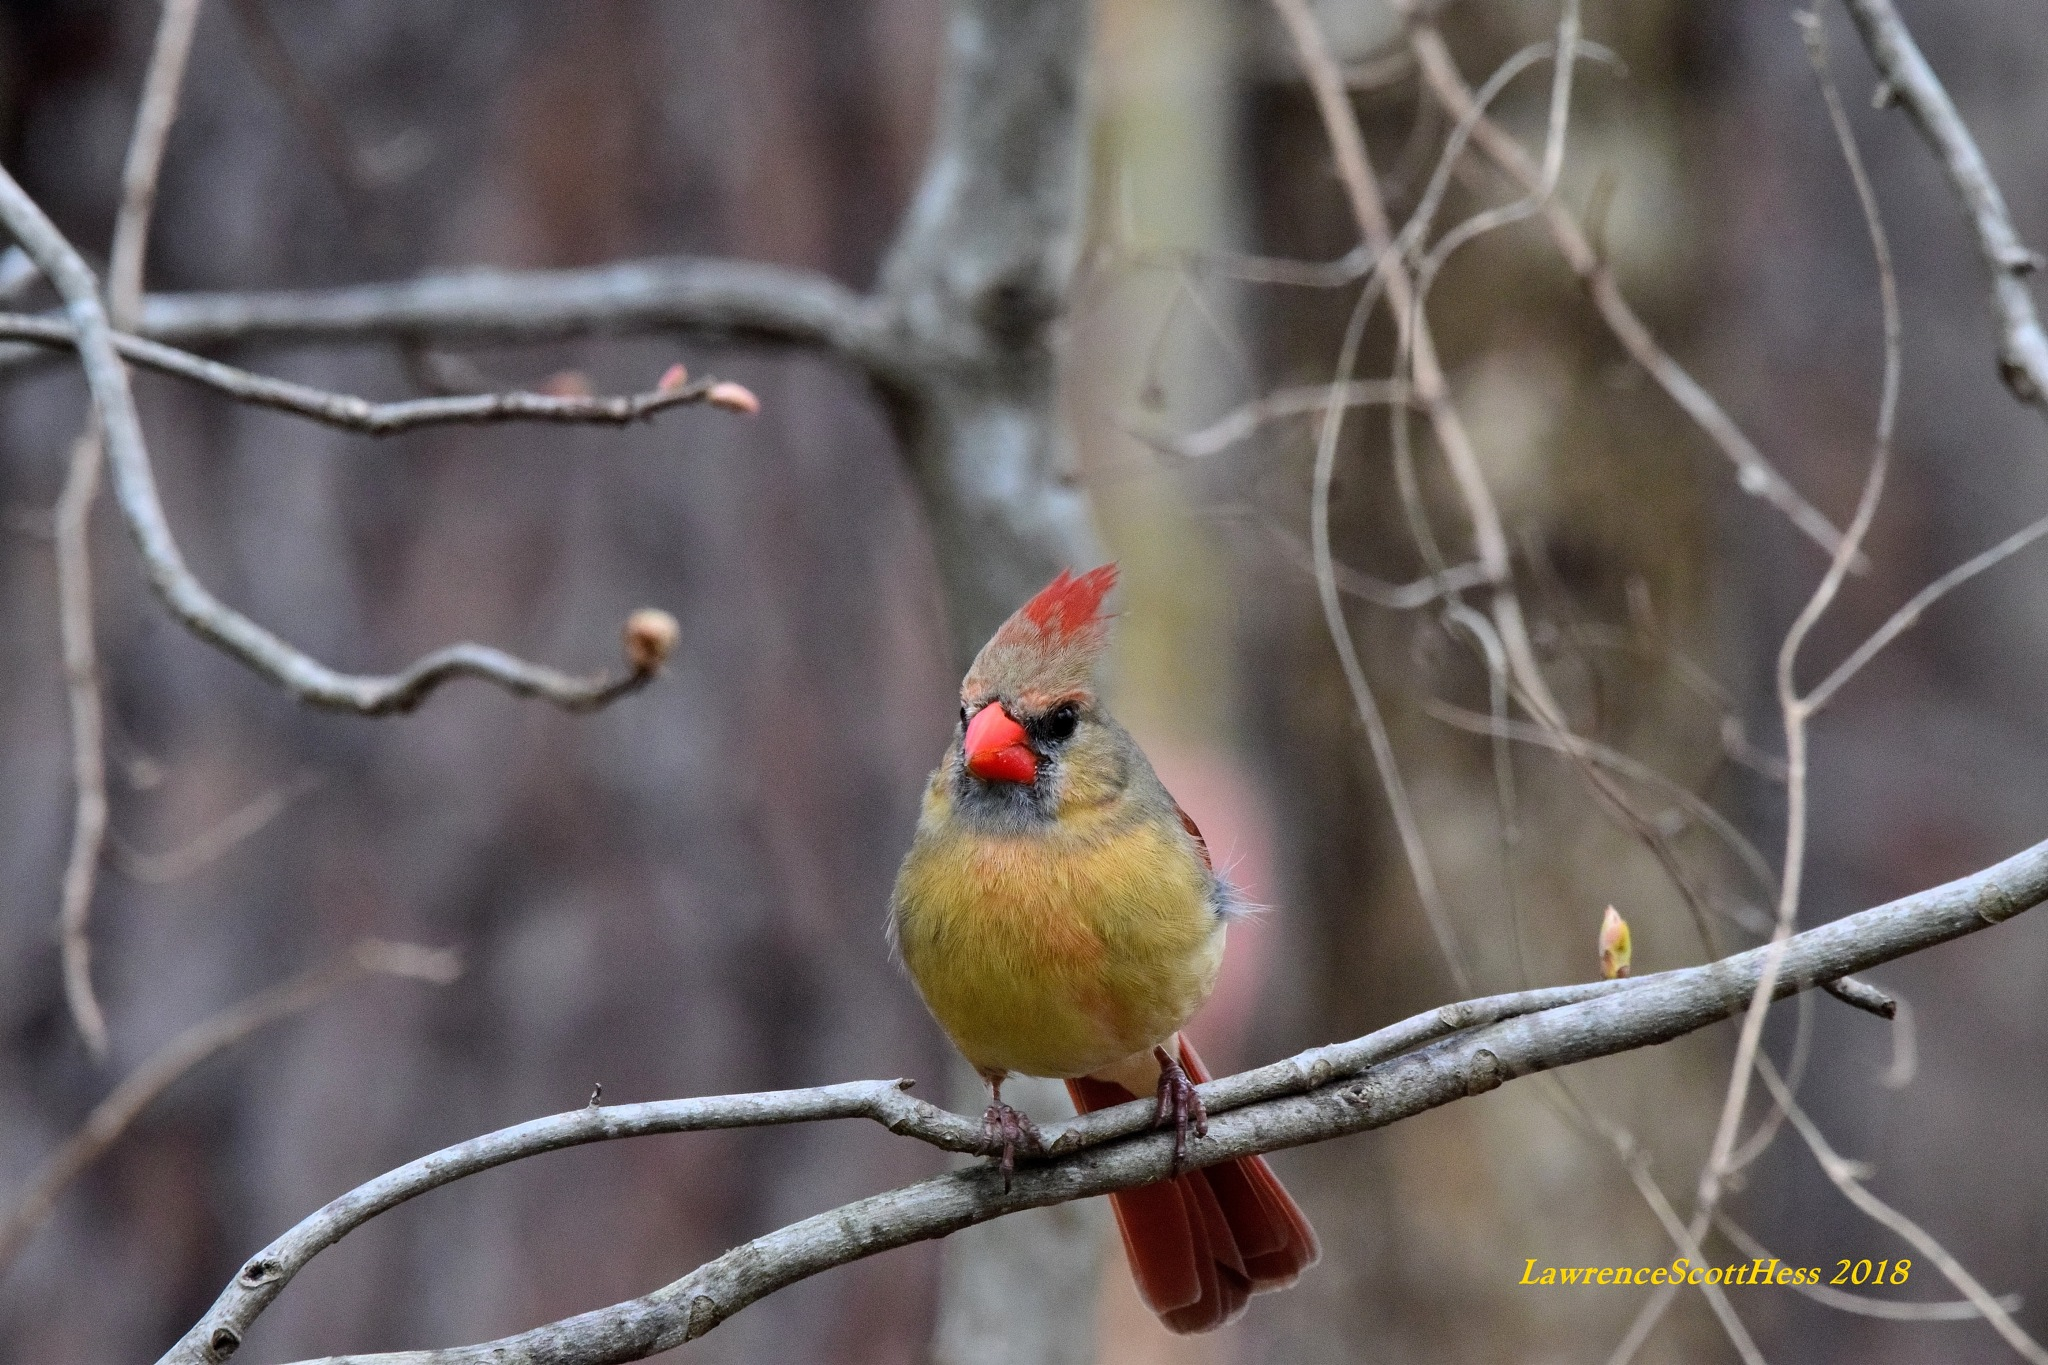 Scotty's Art 181~The Pretty Cardinal by Lawrence Scott Hess